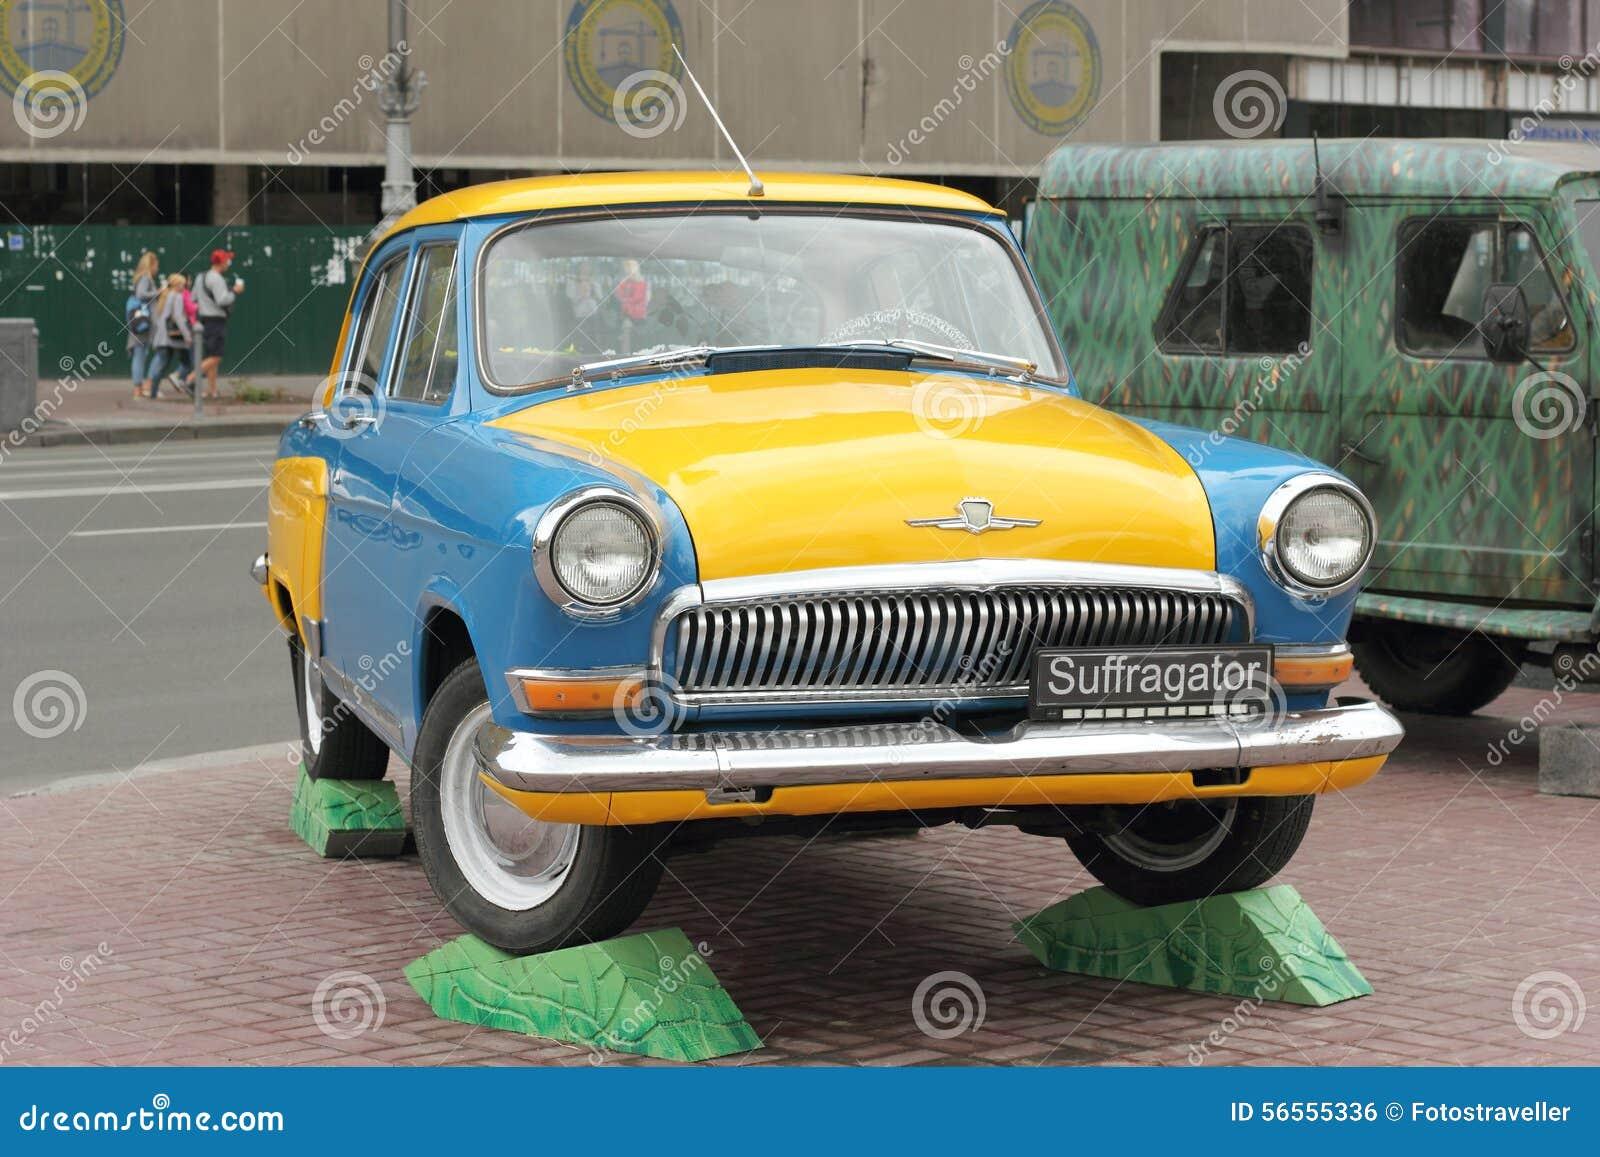 Download αυτοκίνητο αναδρομικό εκδοτική εικόνες. εικόνα από ανεξαρτησία - 56555336